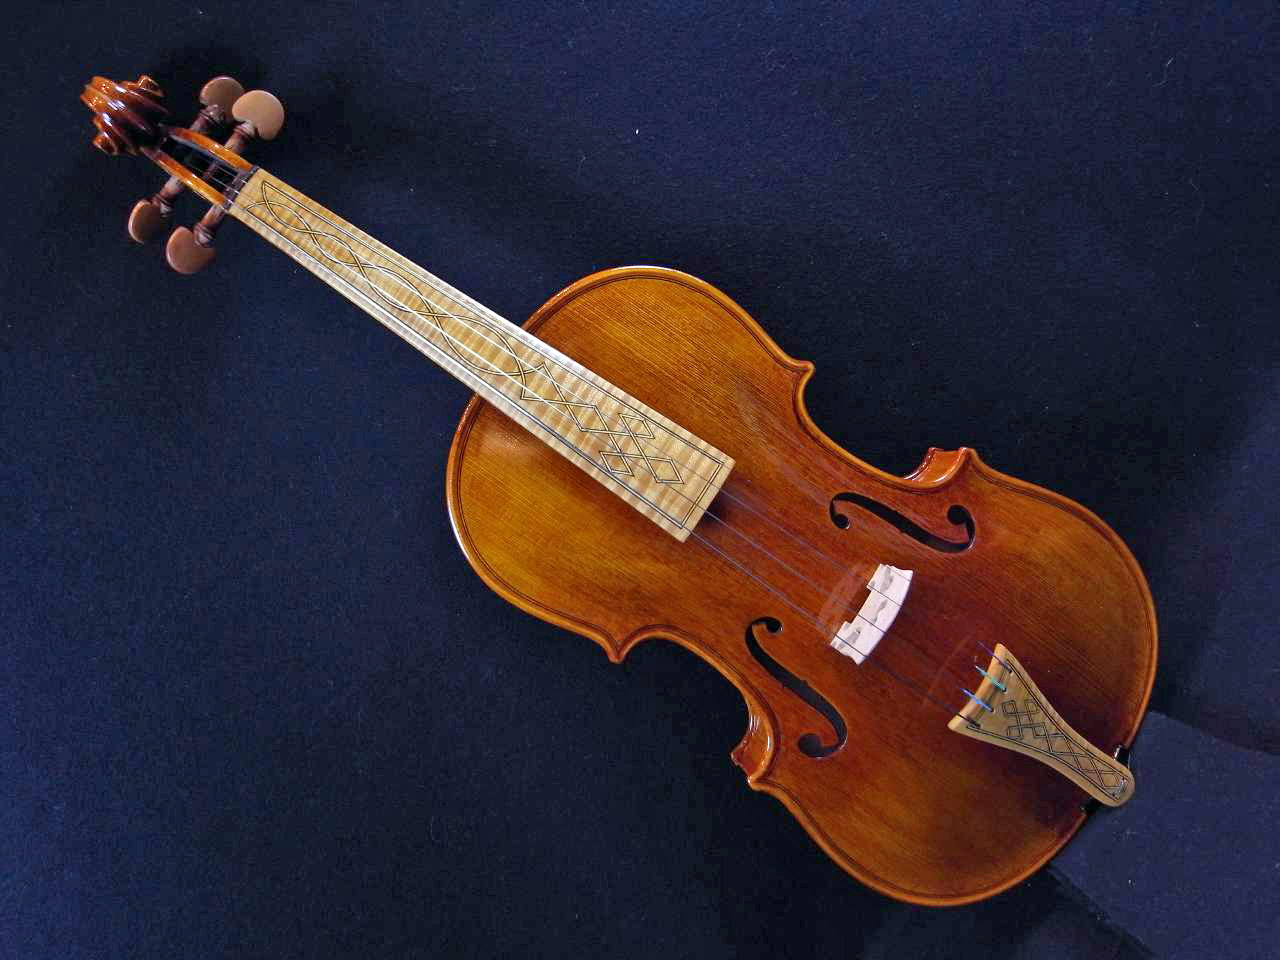 LiuXi工房ファインレベル・バロックバイオリン・メープル指板